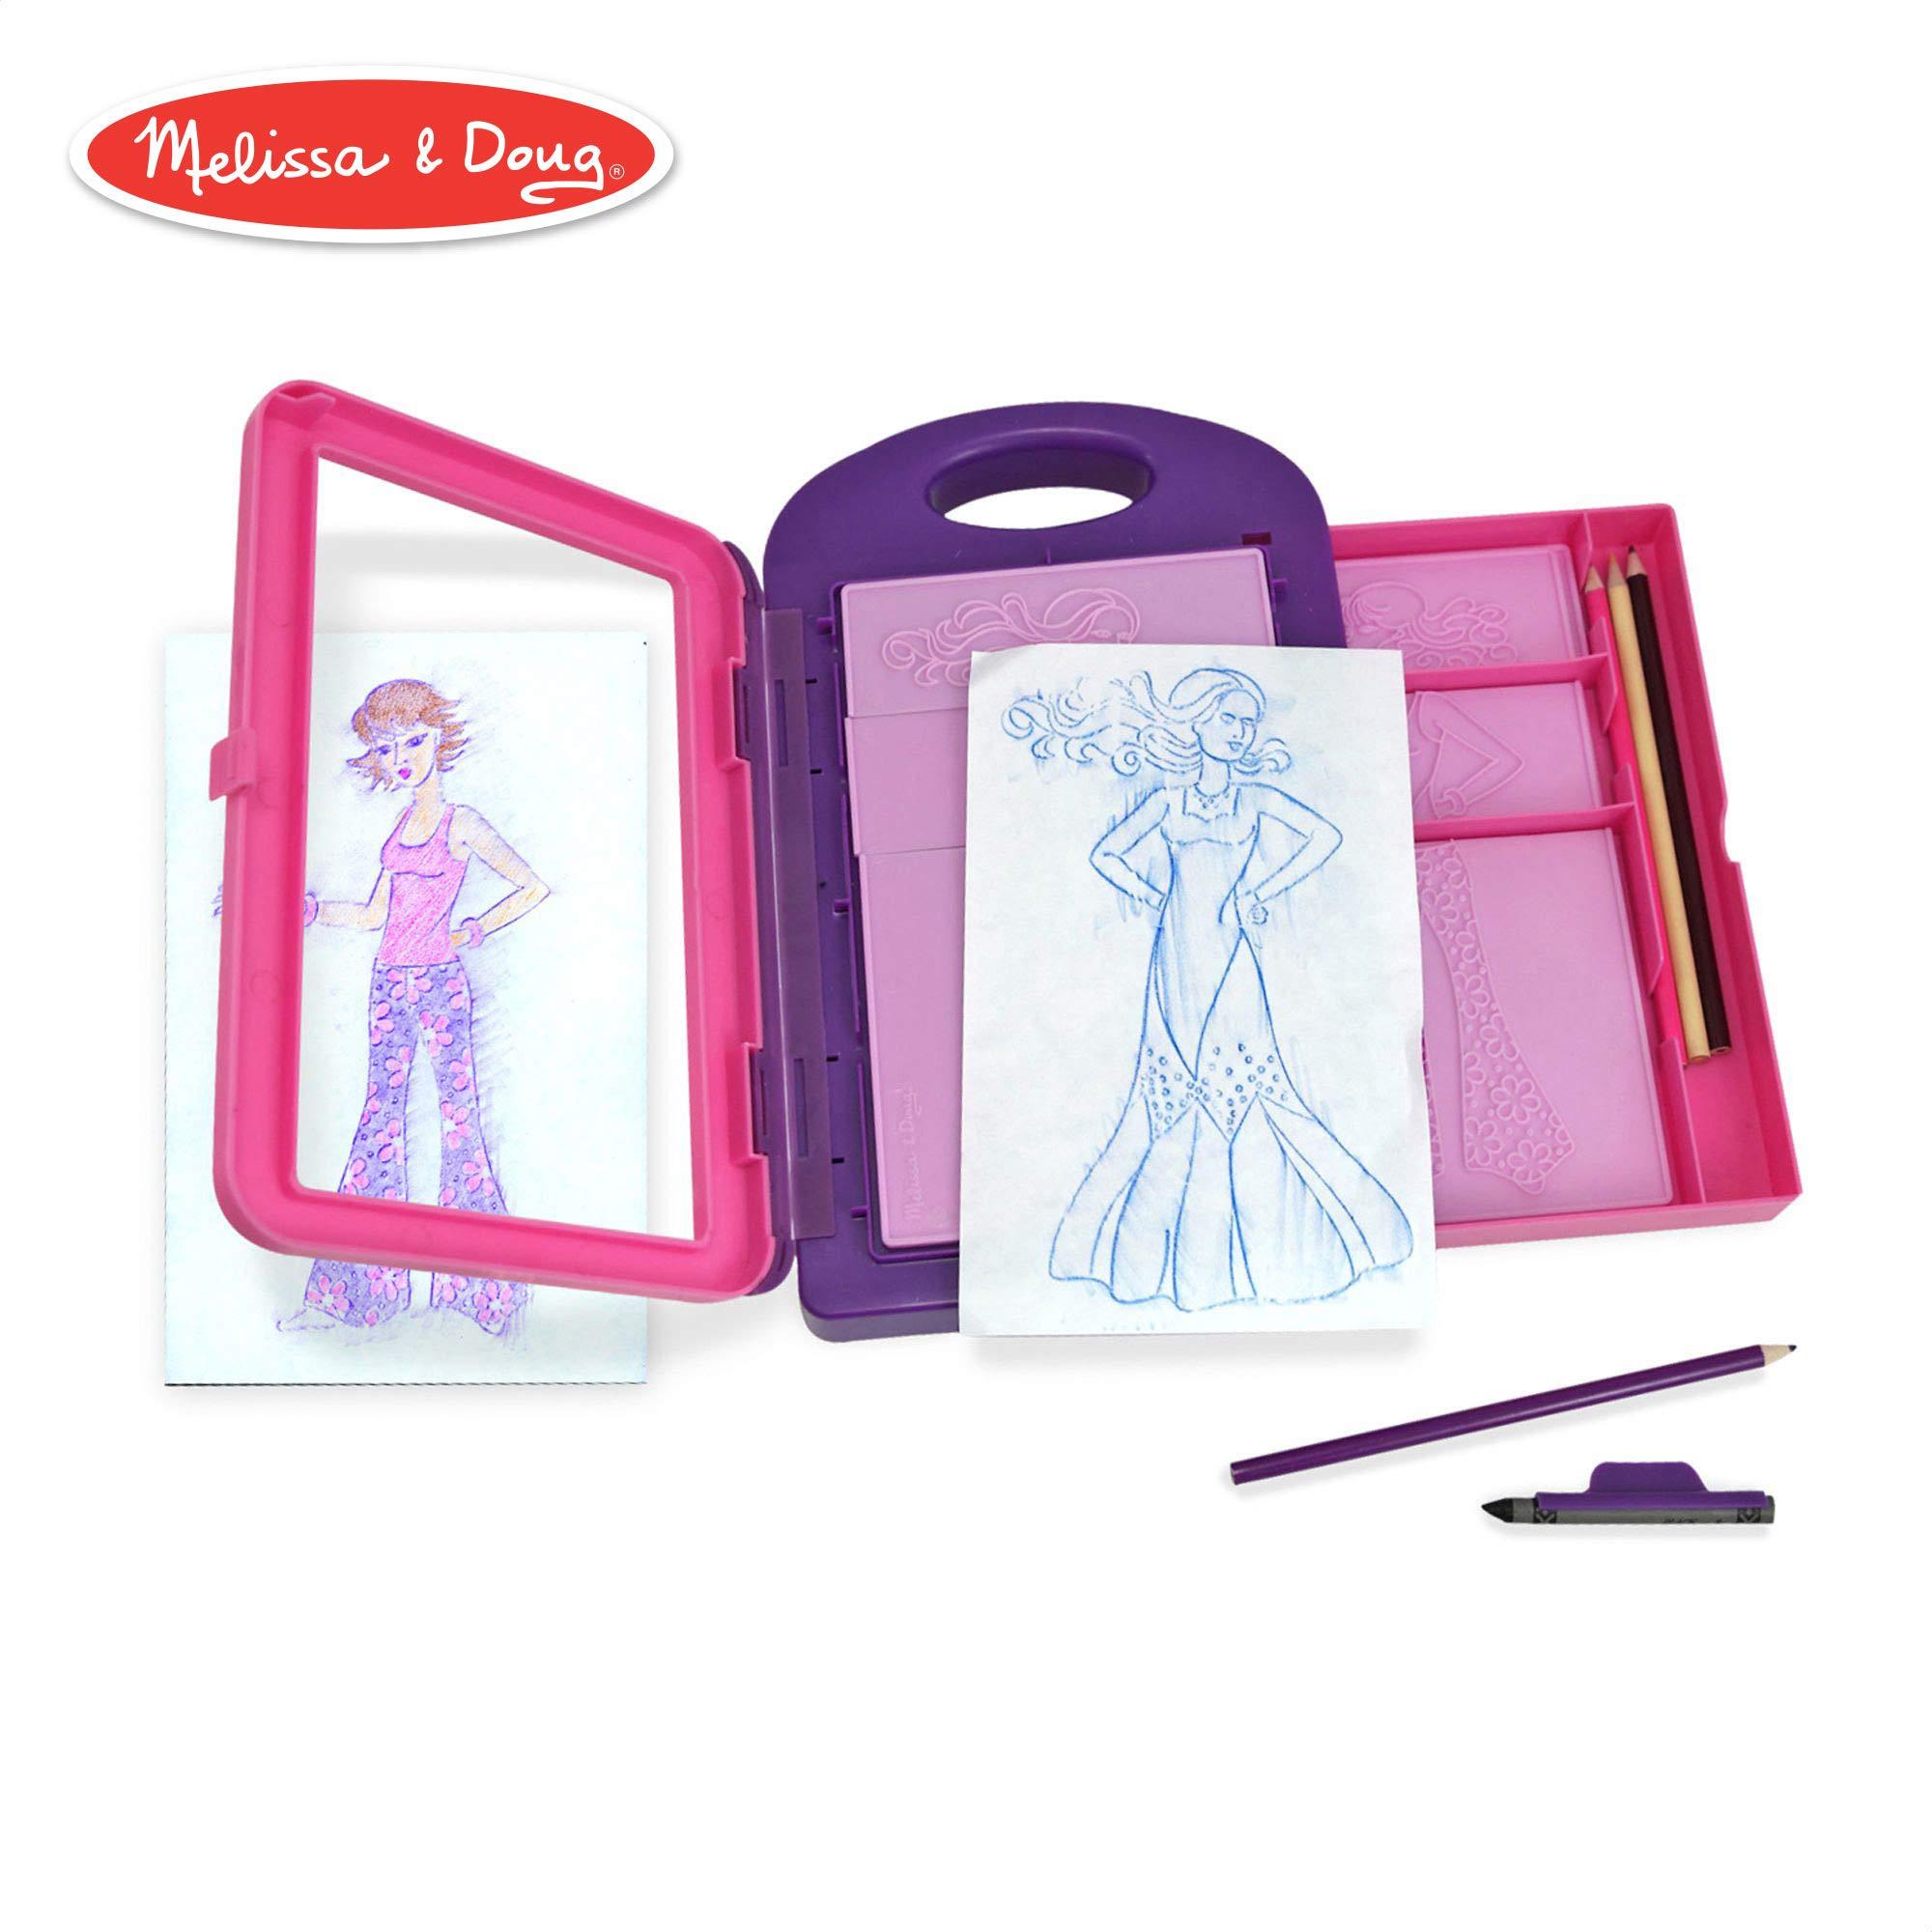 Melissa & Doug Fashion Design Activity Kit (Arts & Crafts, 9 Double-Sided Rubbing Plates, 4 Pencils, Crayon, 16 Pieces) by Melissa & Doug